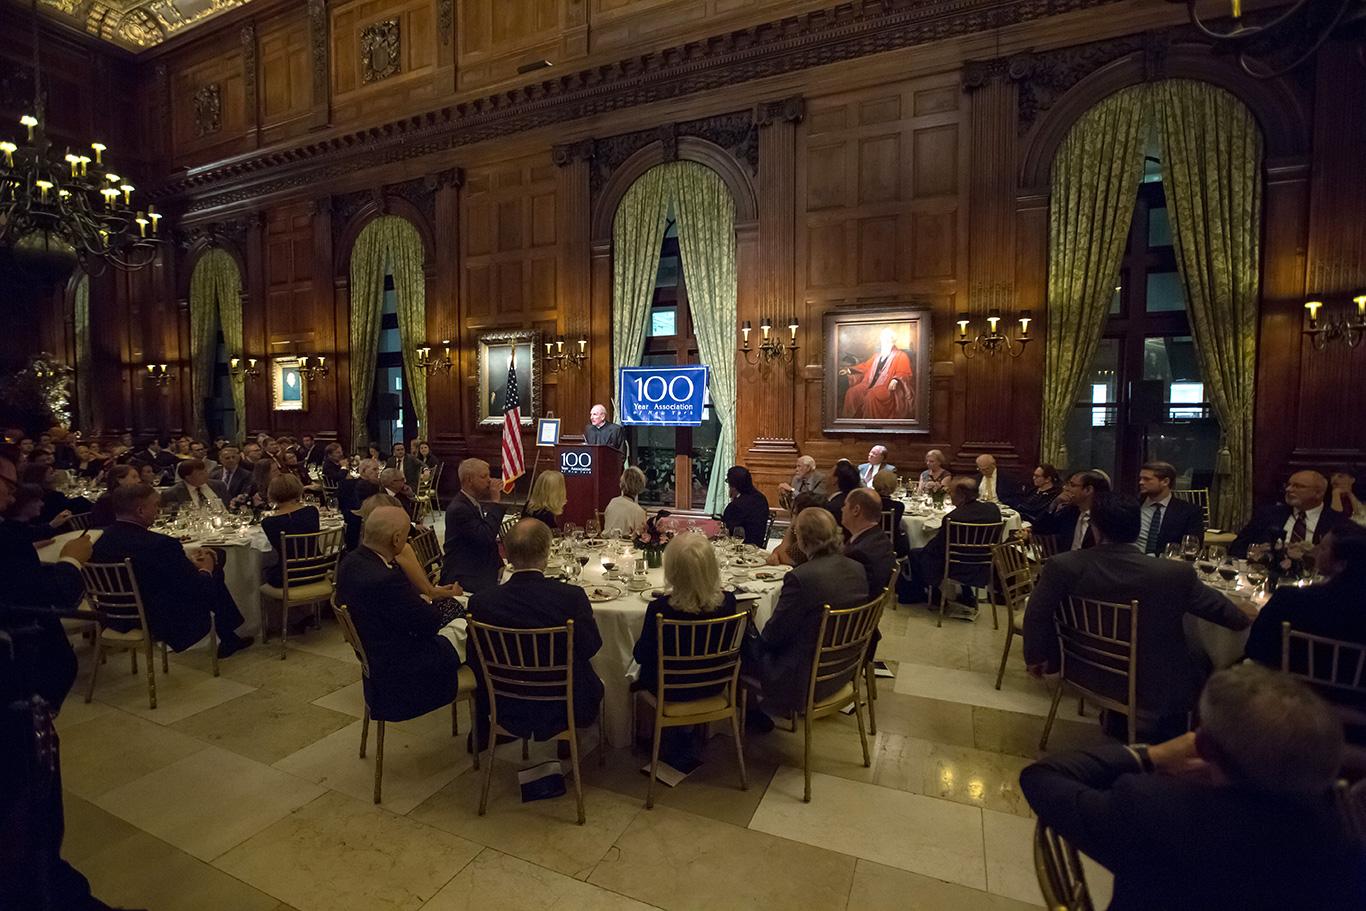 Upcoming alumni events fordham university all basketball for 100 church street 8th floor new york ny 10007